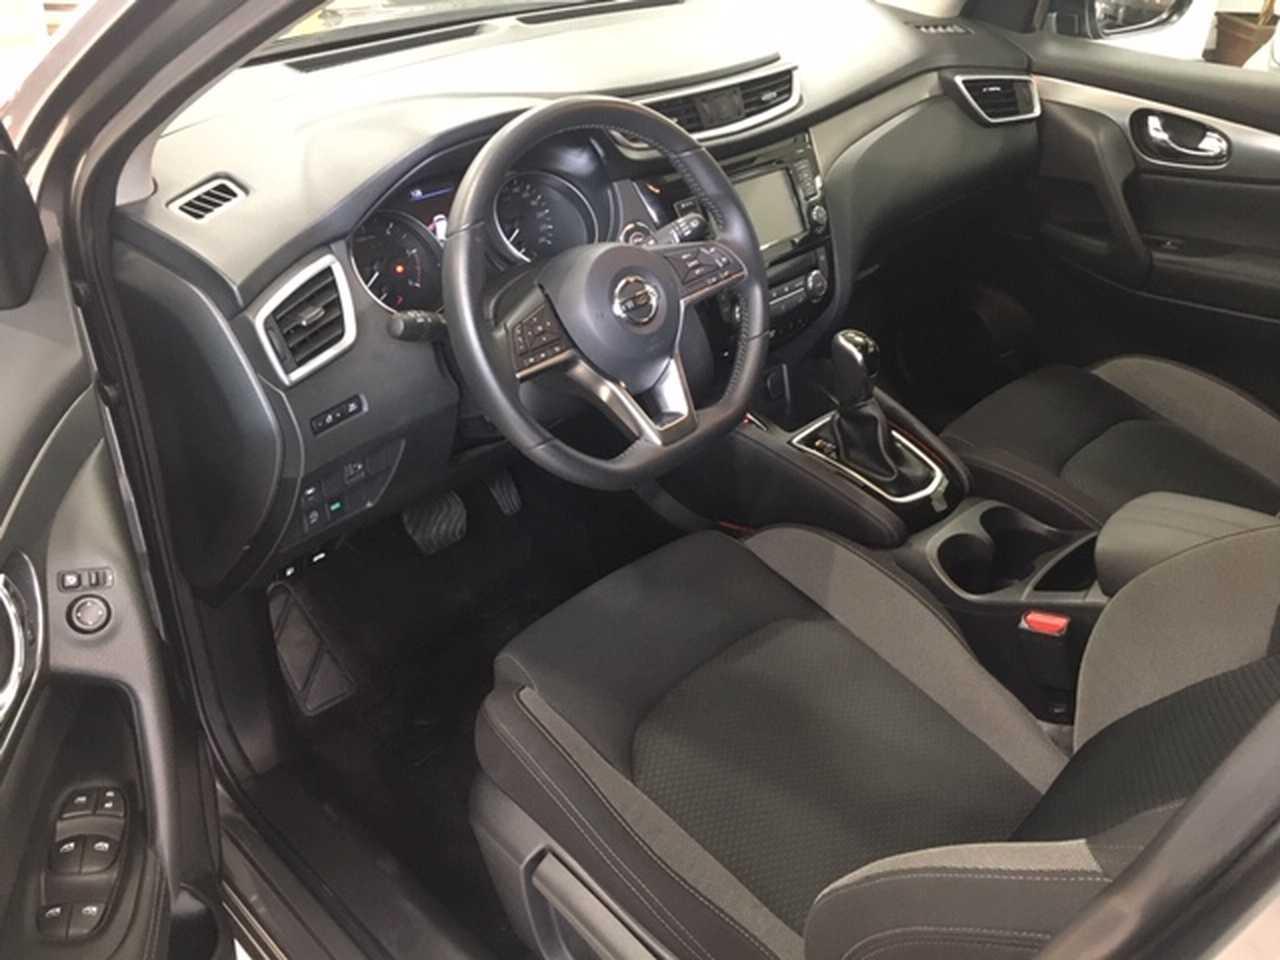 Nissan Qashqai 1.5 DCI 115CV DCT NCONNECTA 5P full